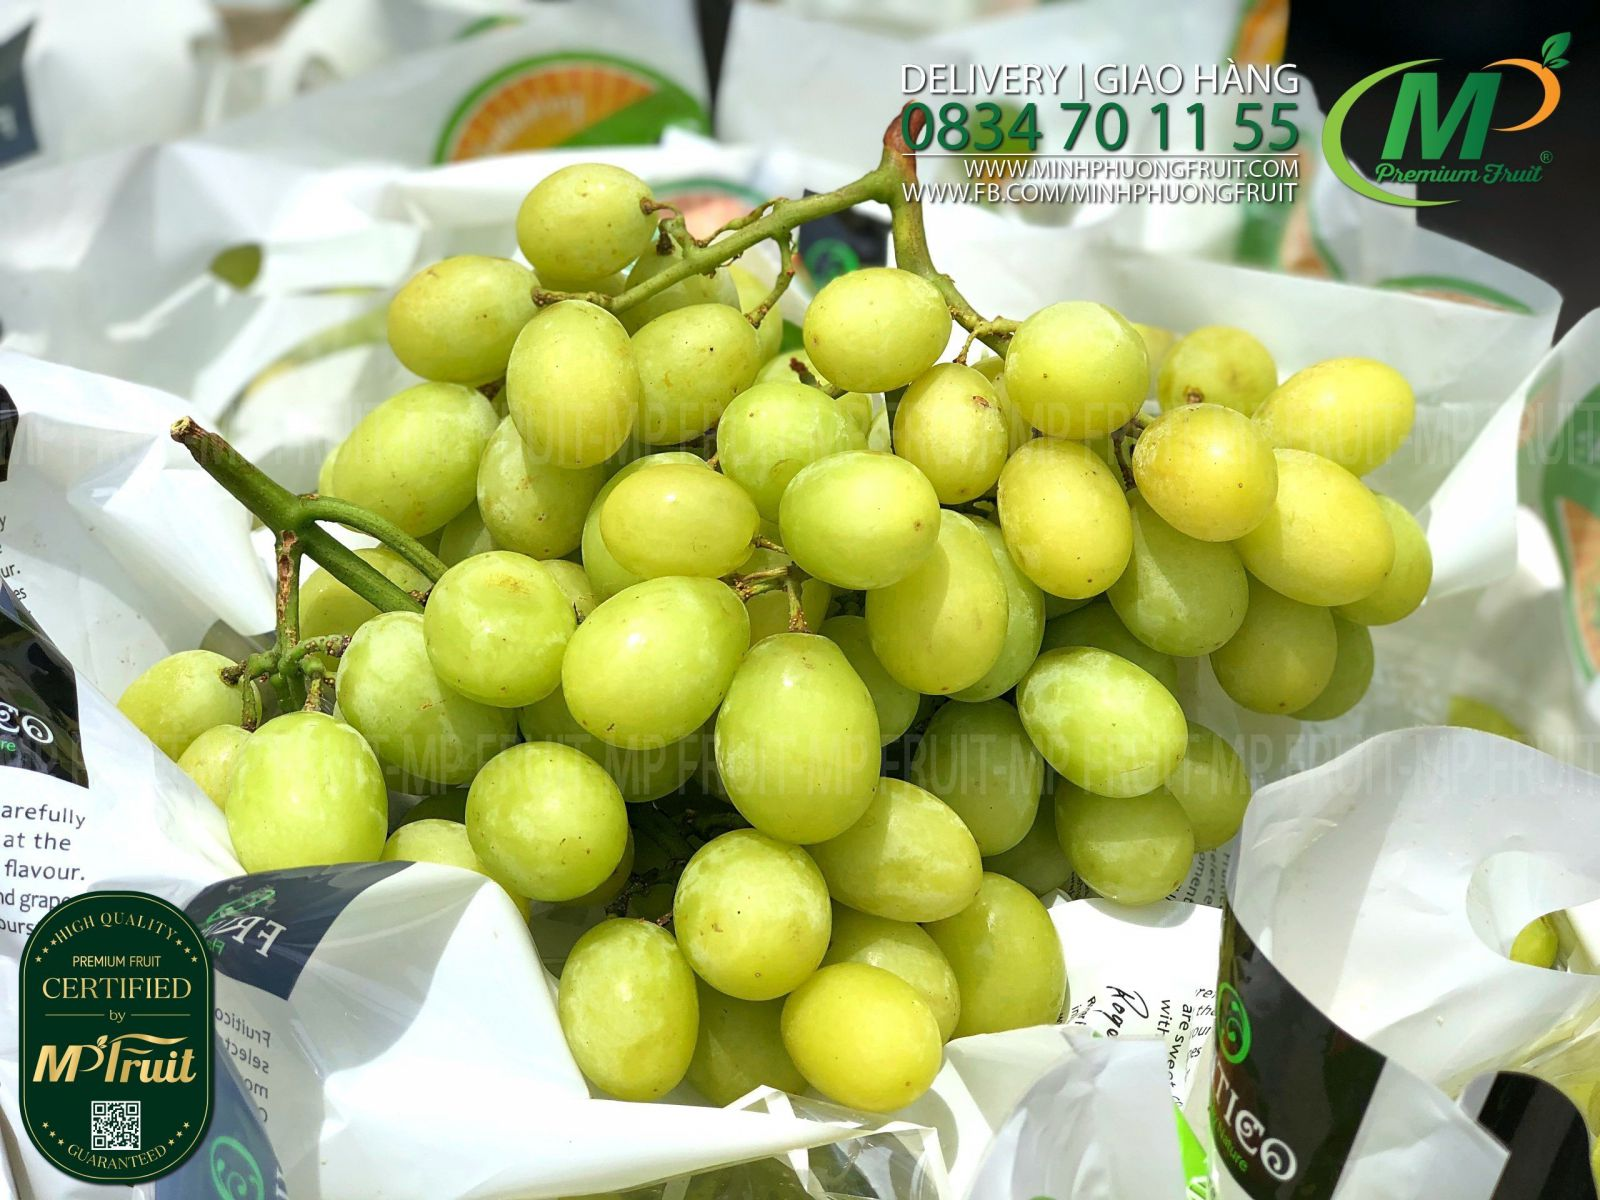 Nho Xanh Autumn Crisp Úc   Fruitico - size Jumbo quả siêu to - MP Fruit